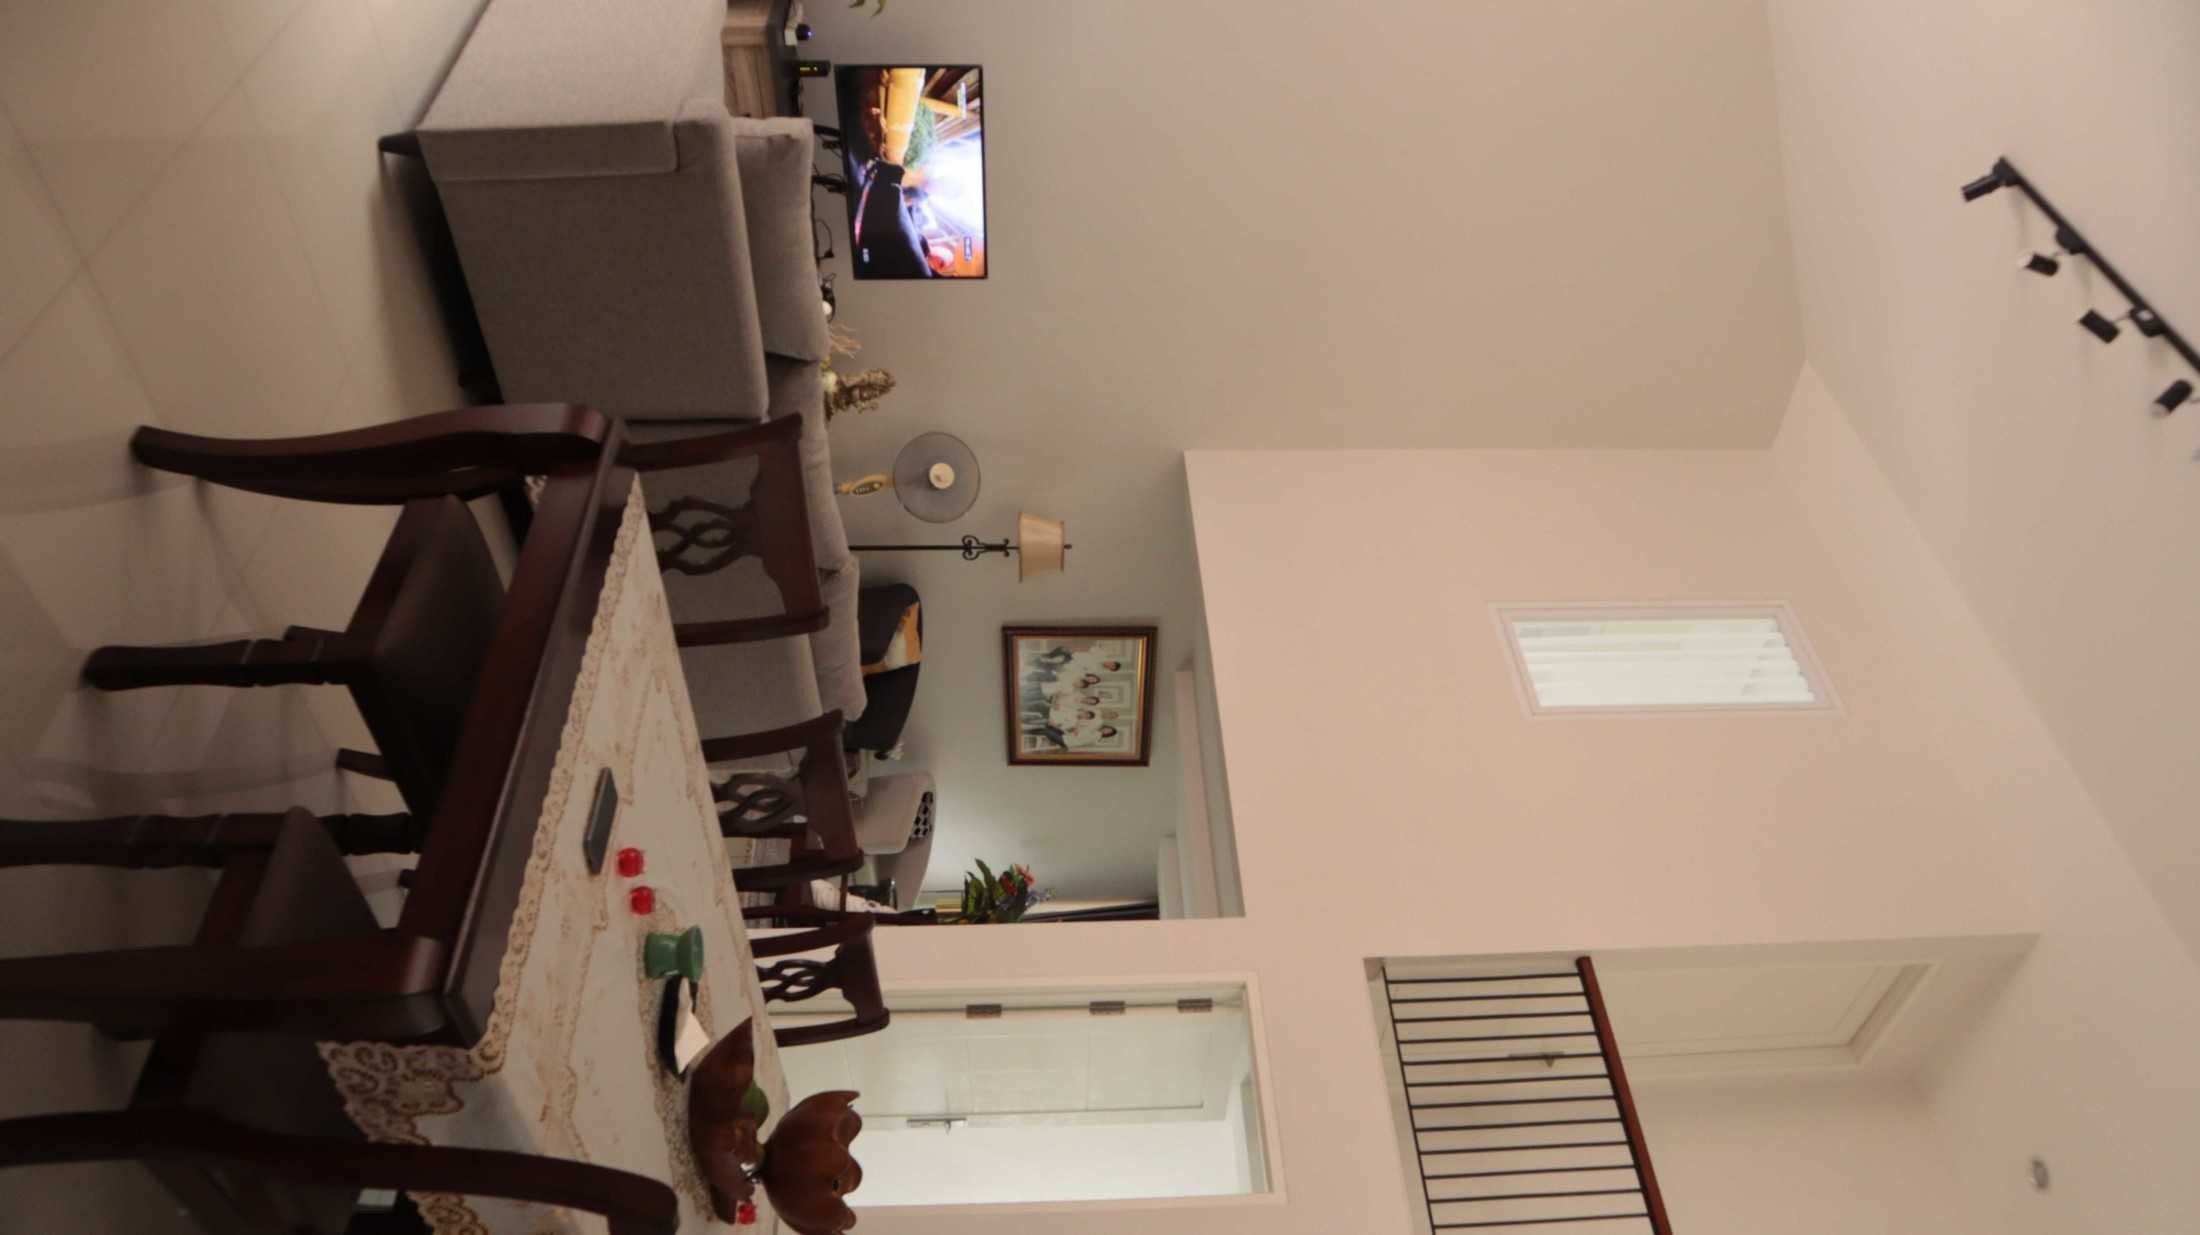 Eip Architect Sa House Kec. Tebet, Kota Jakarta Selatan, Daerah Khusus Ibukota Jakarta, Indonesia Kec. Tebet, Kota Jakarta Selatan, Daerah Khusus Ibukota Jakarta, Indonesia Eip-Architect-Sa-House  100219